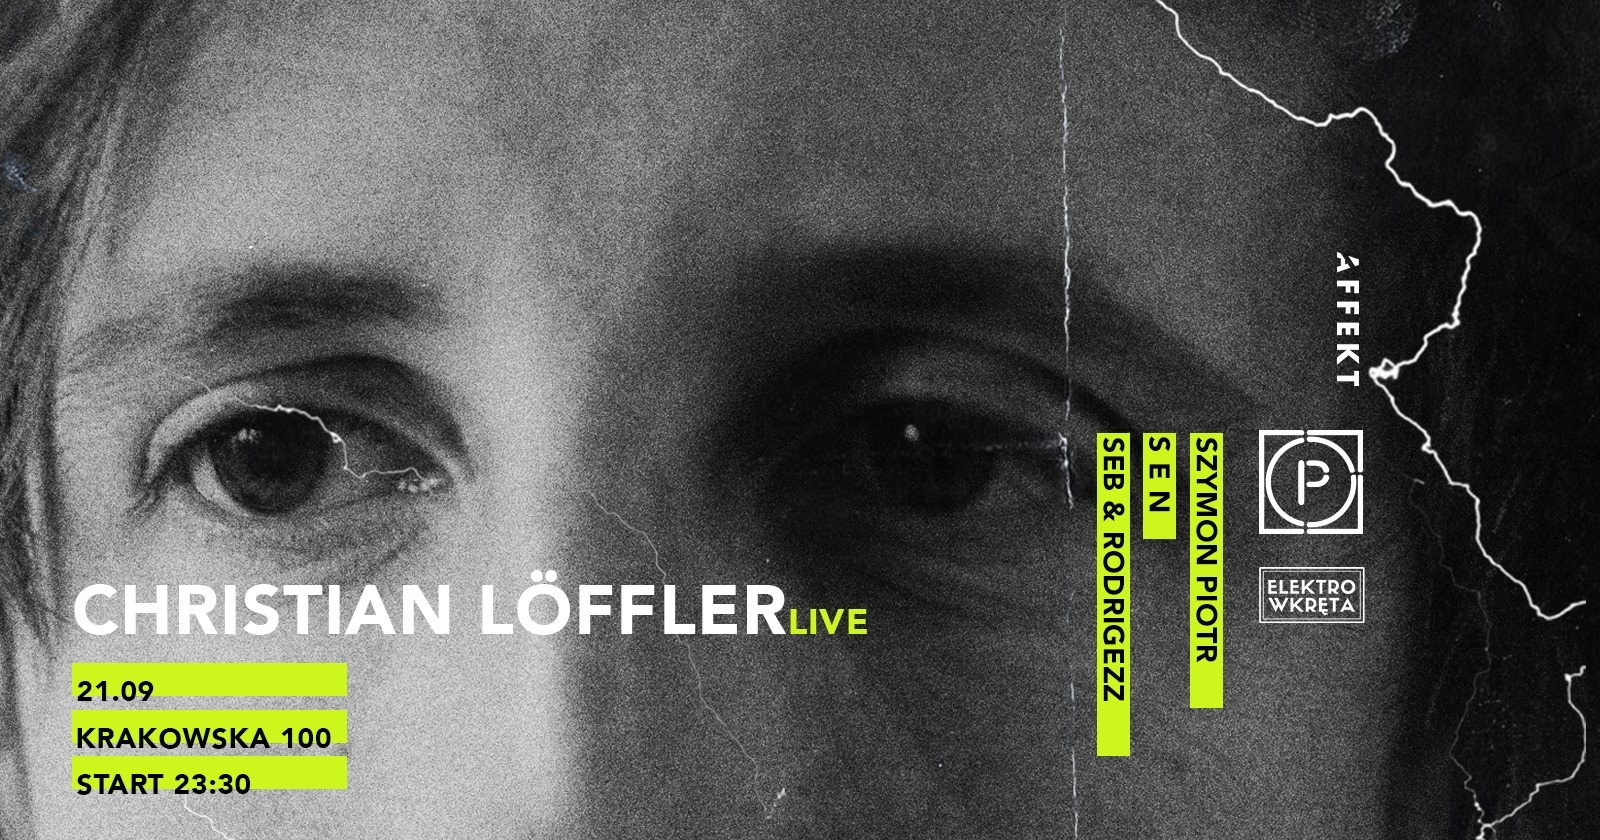 Projekt Pralnia w/ Christian Löffler LIVE